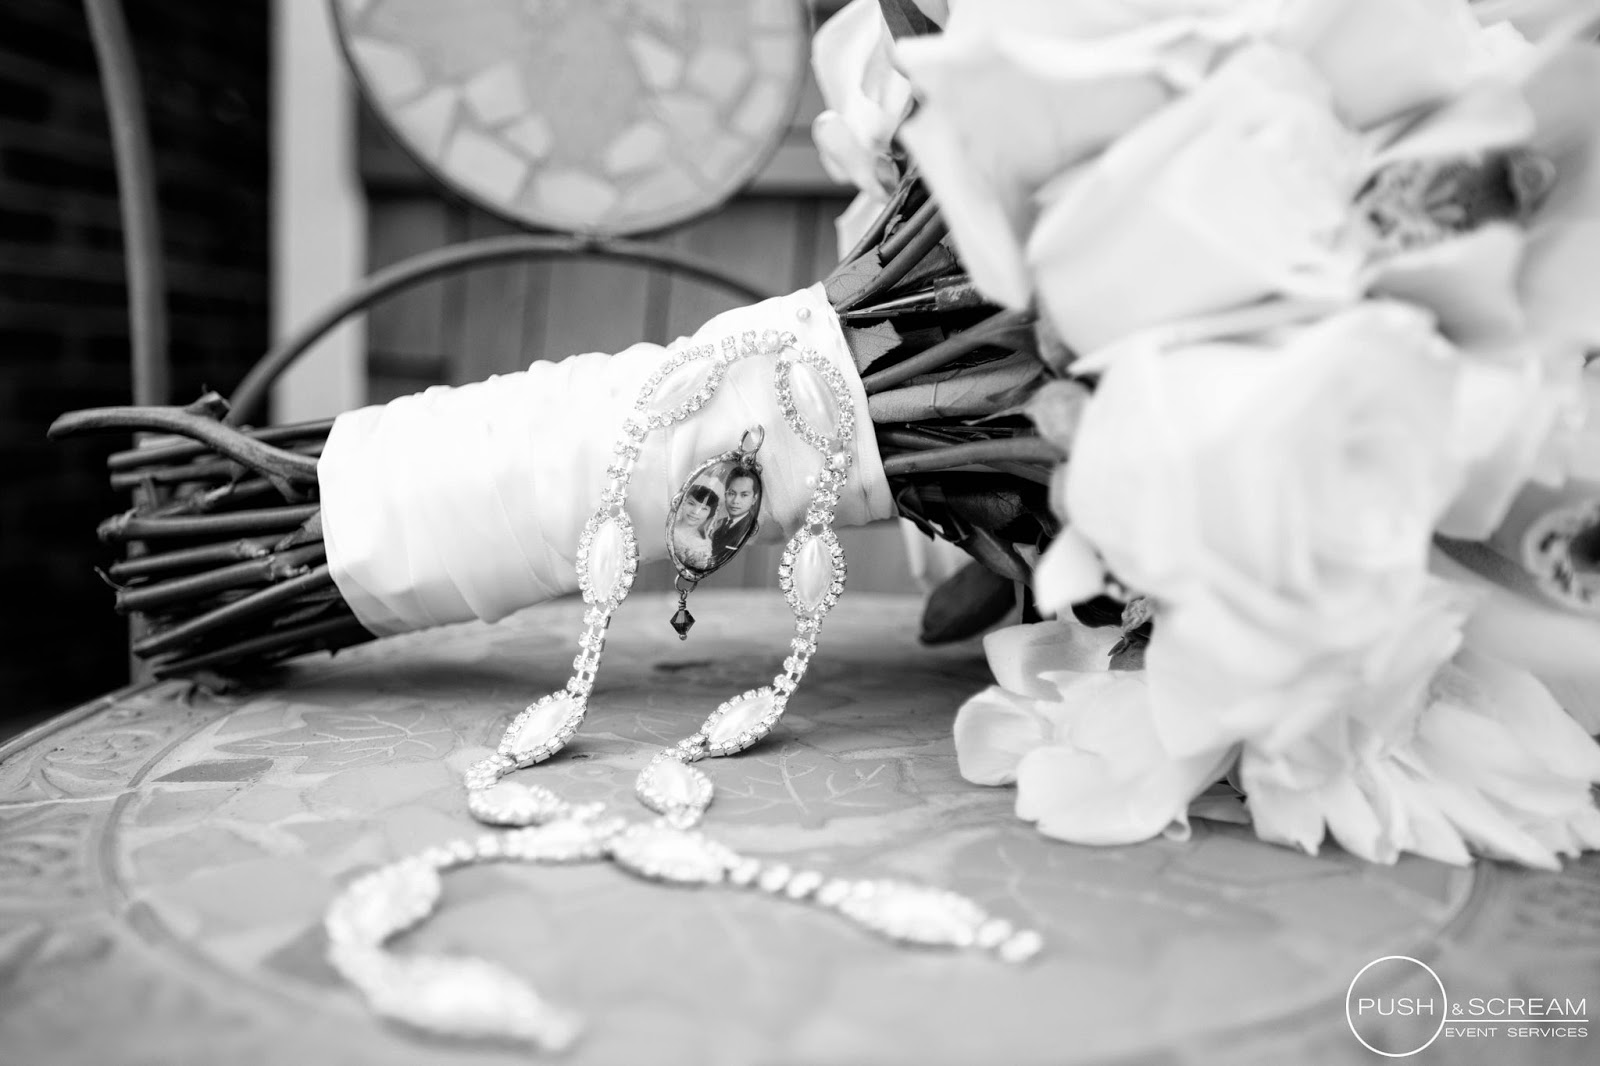 Enchanting The Great Gatsby Themed Wedding Images - Wedding Idea ...